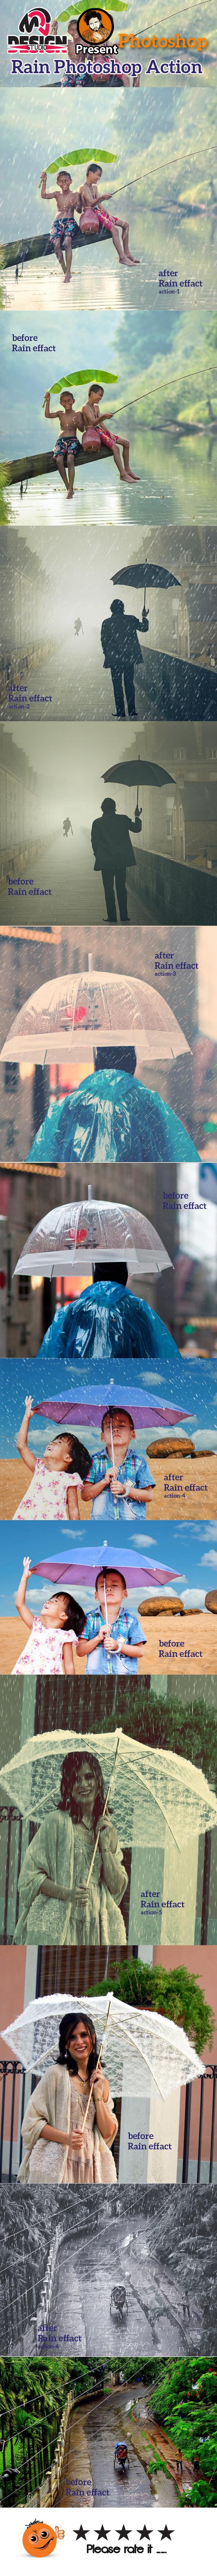 GraphicRiver Rain Photoshop Action 10328345